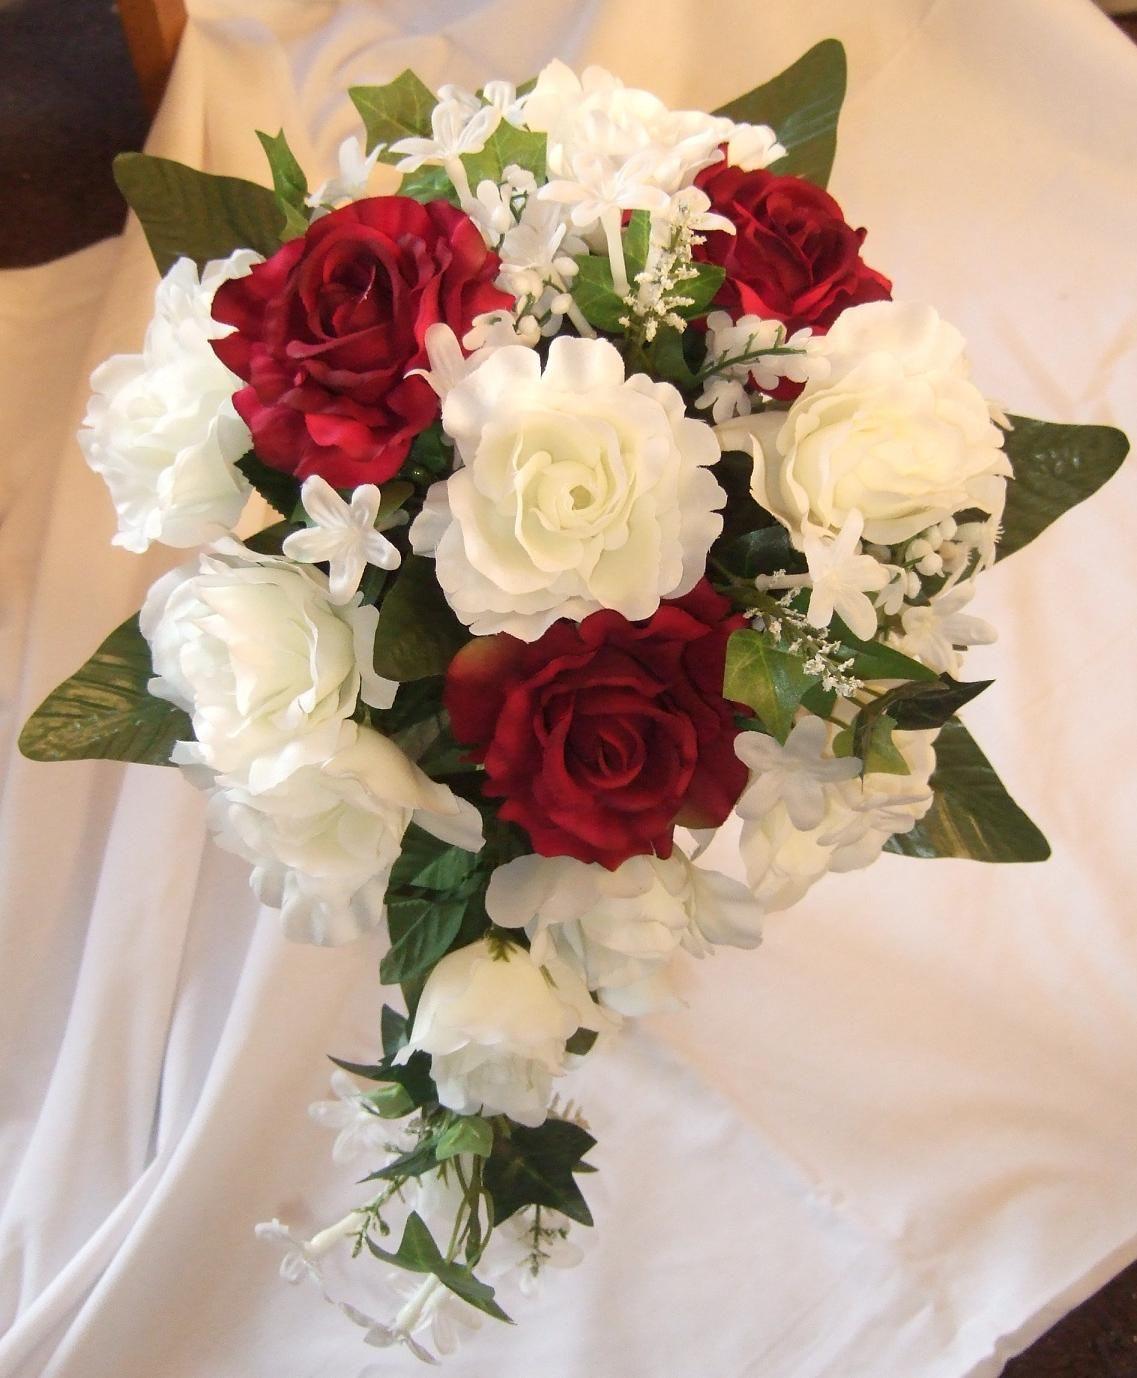 Burgundy Silk Wedding Flower Ideas Burgundy and white